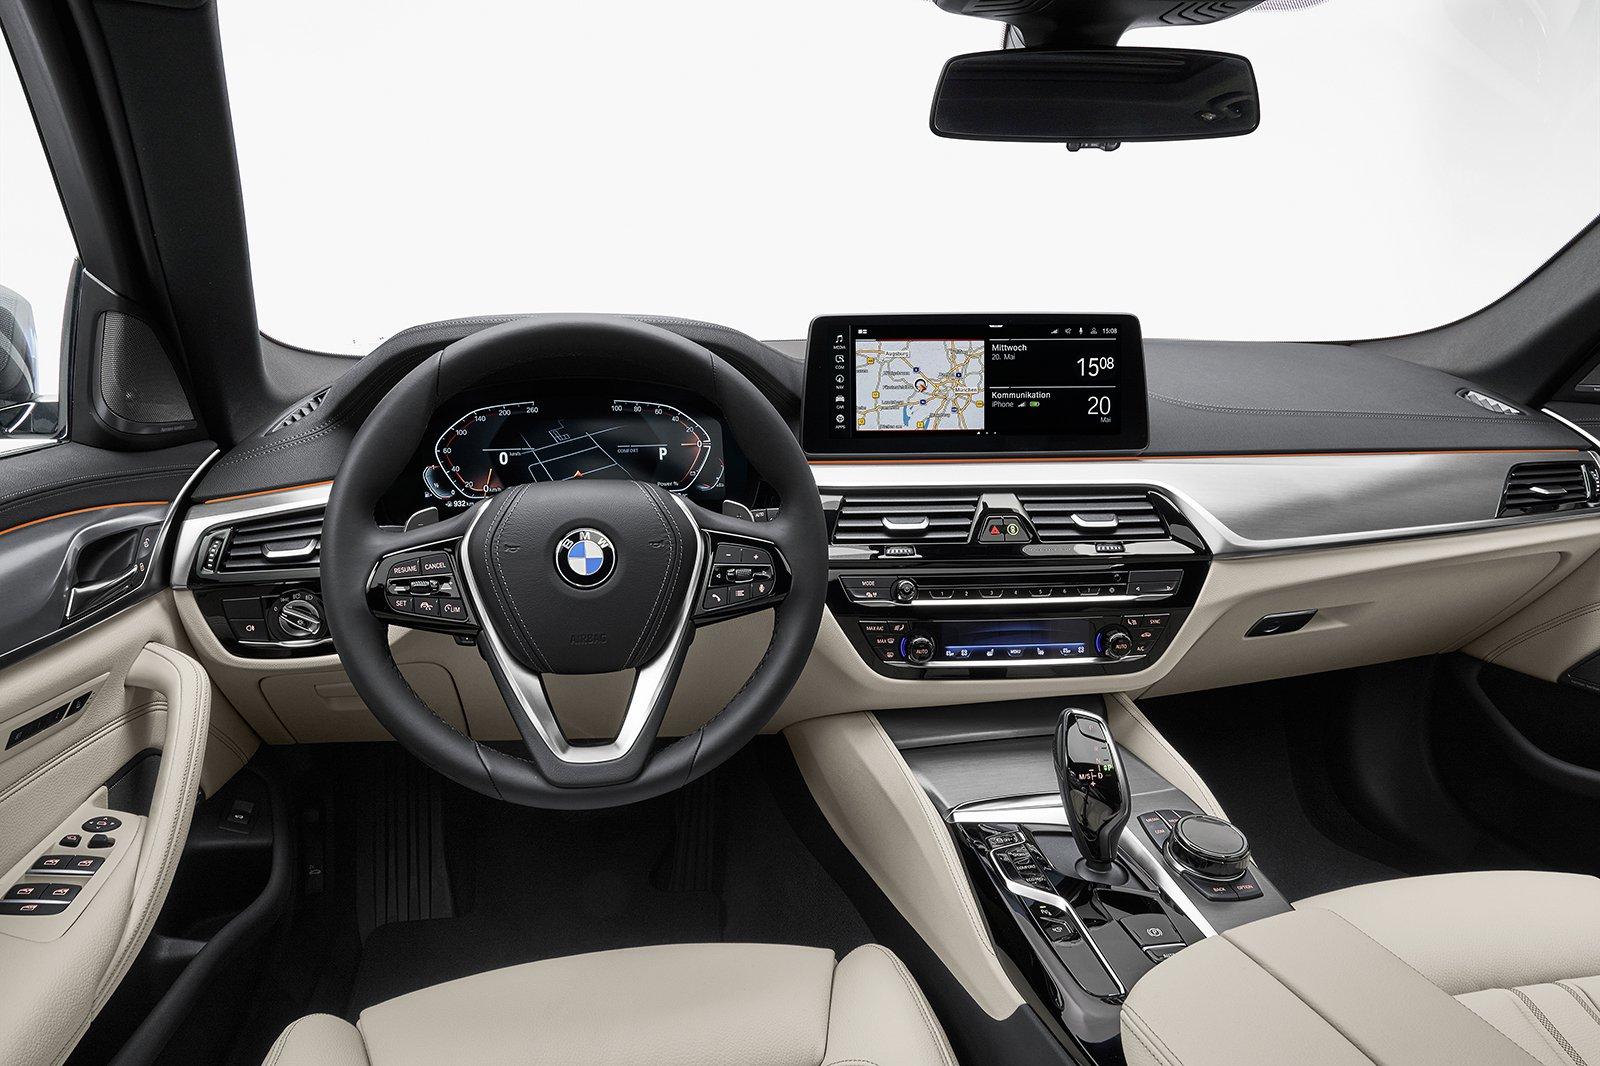 BMW 5 Series Touring 2020 dashboard